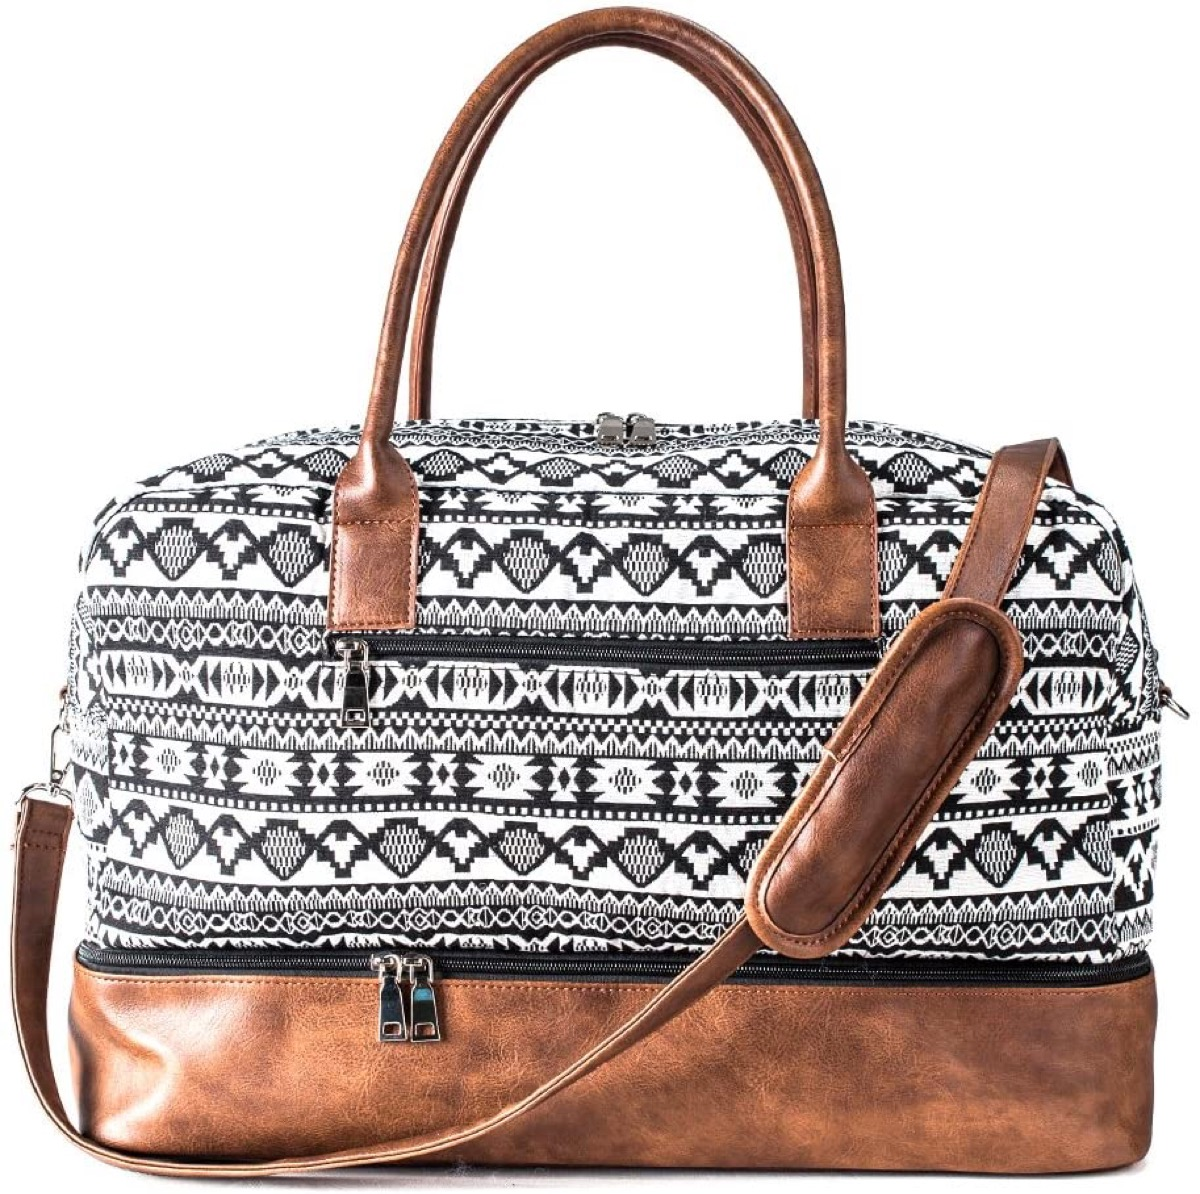 large black and white patterned shoulder bag with brown bottom